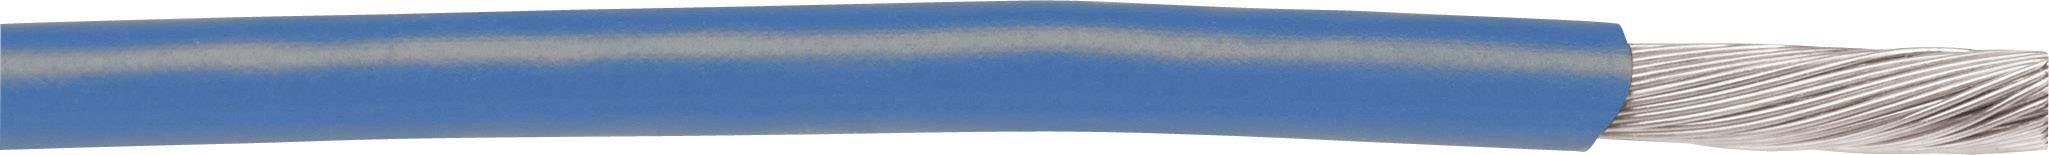 Pletenica EcoWire 1 x 3.31 mm, modra AlphaWire 6718 30.5 m